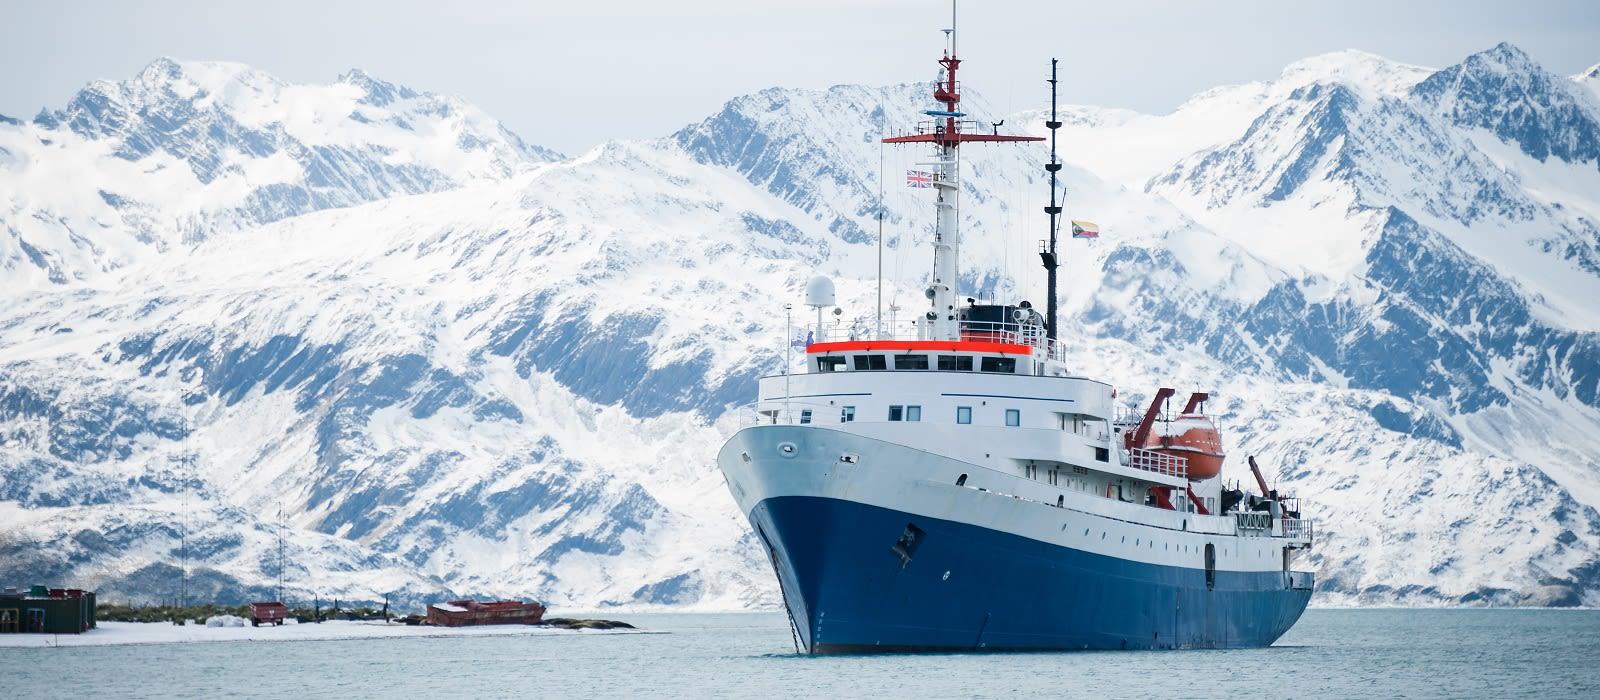 Adventures of the Southern Ocean: Falklands, South Georgia & Antarctica Tour Trip 4